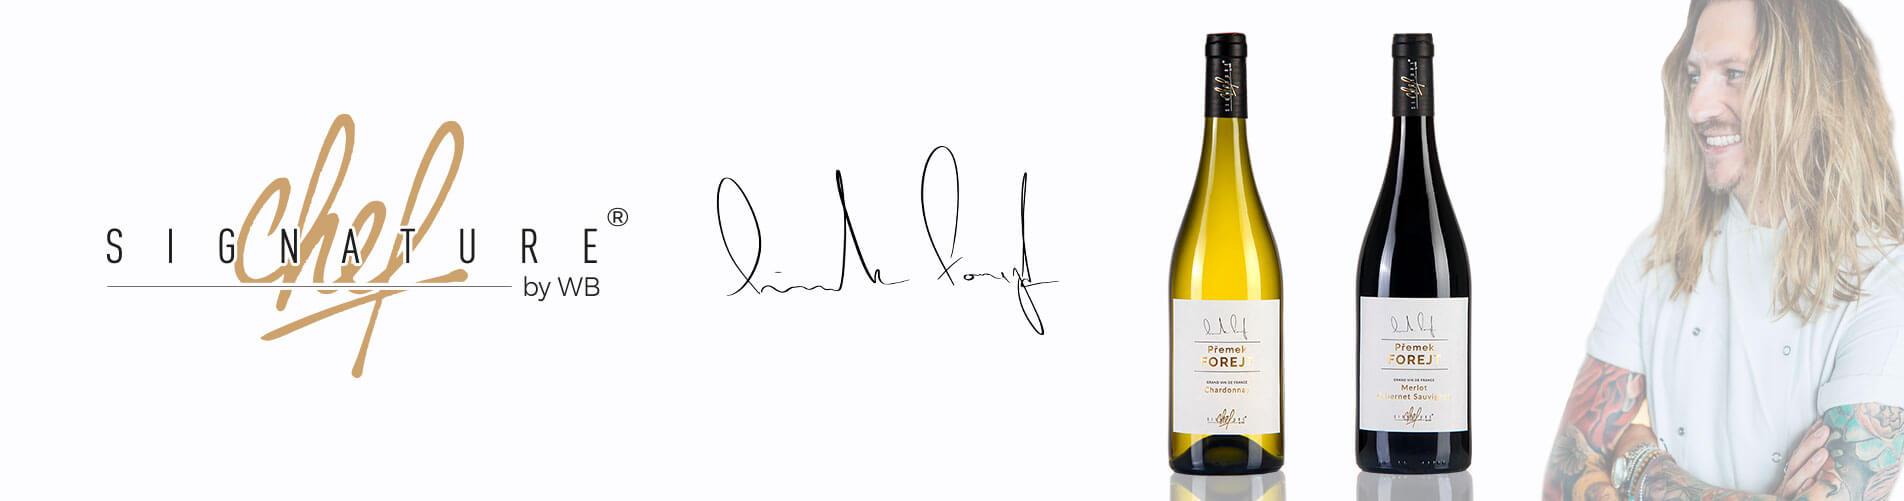 signature-chef-wines-brands-premek-forejt